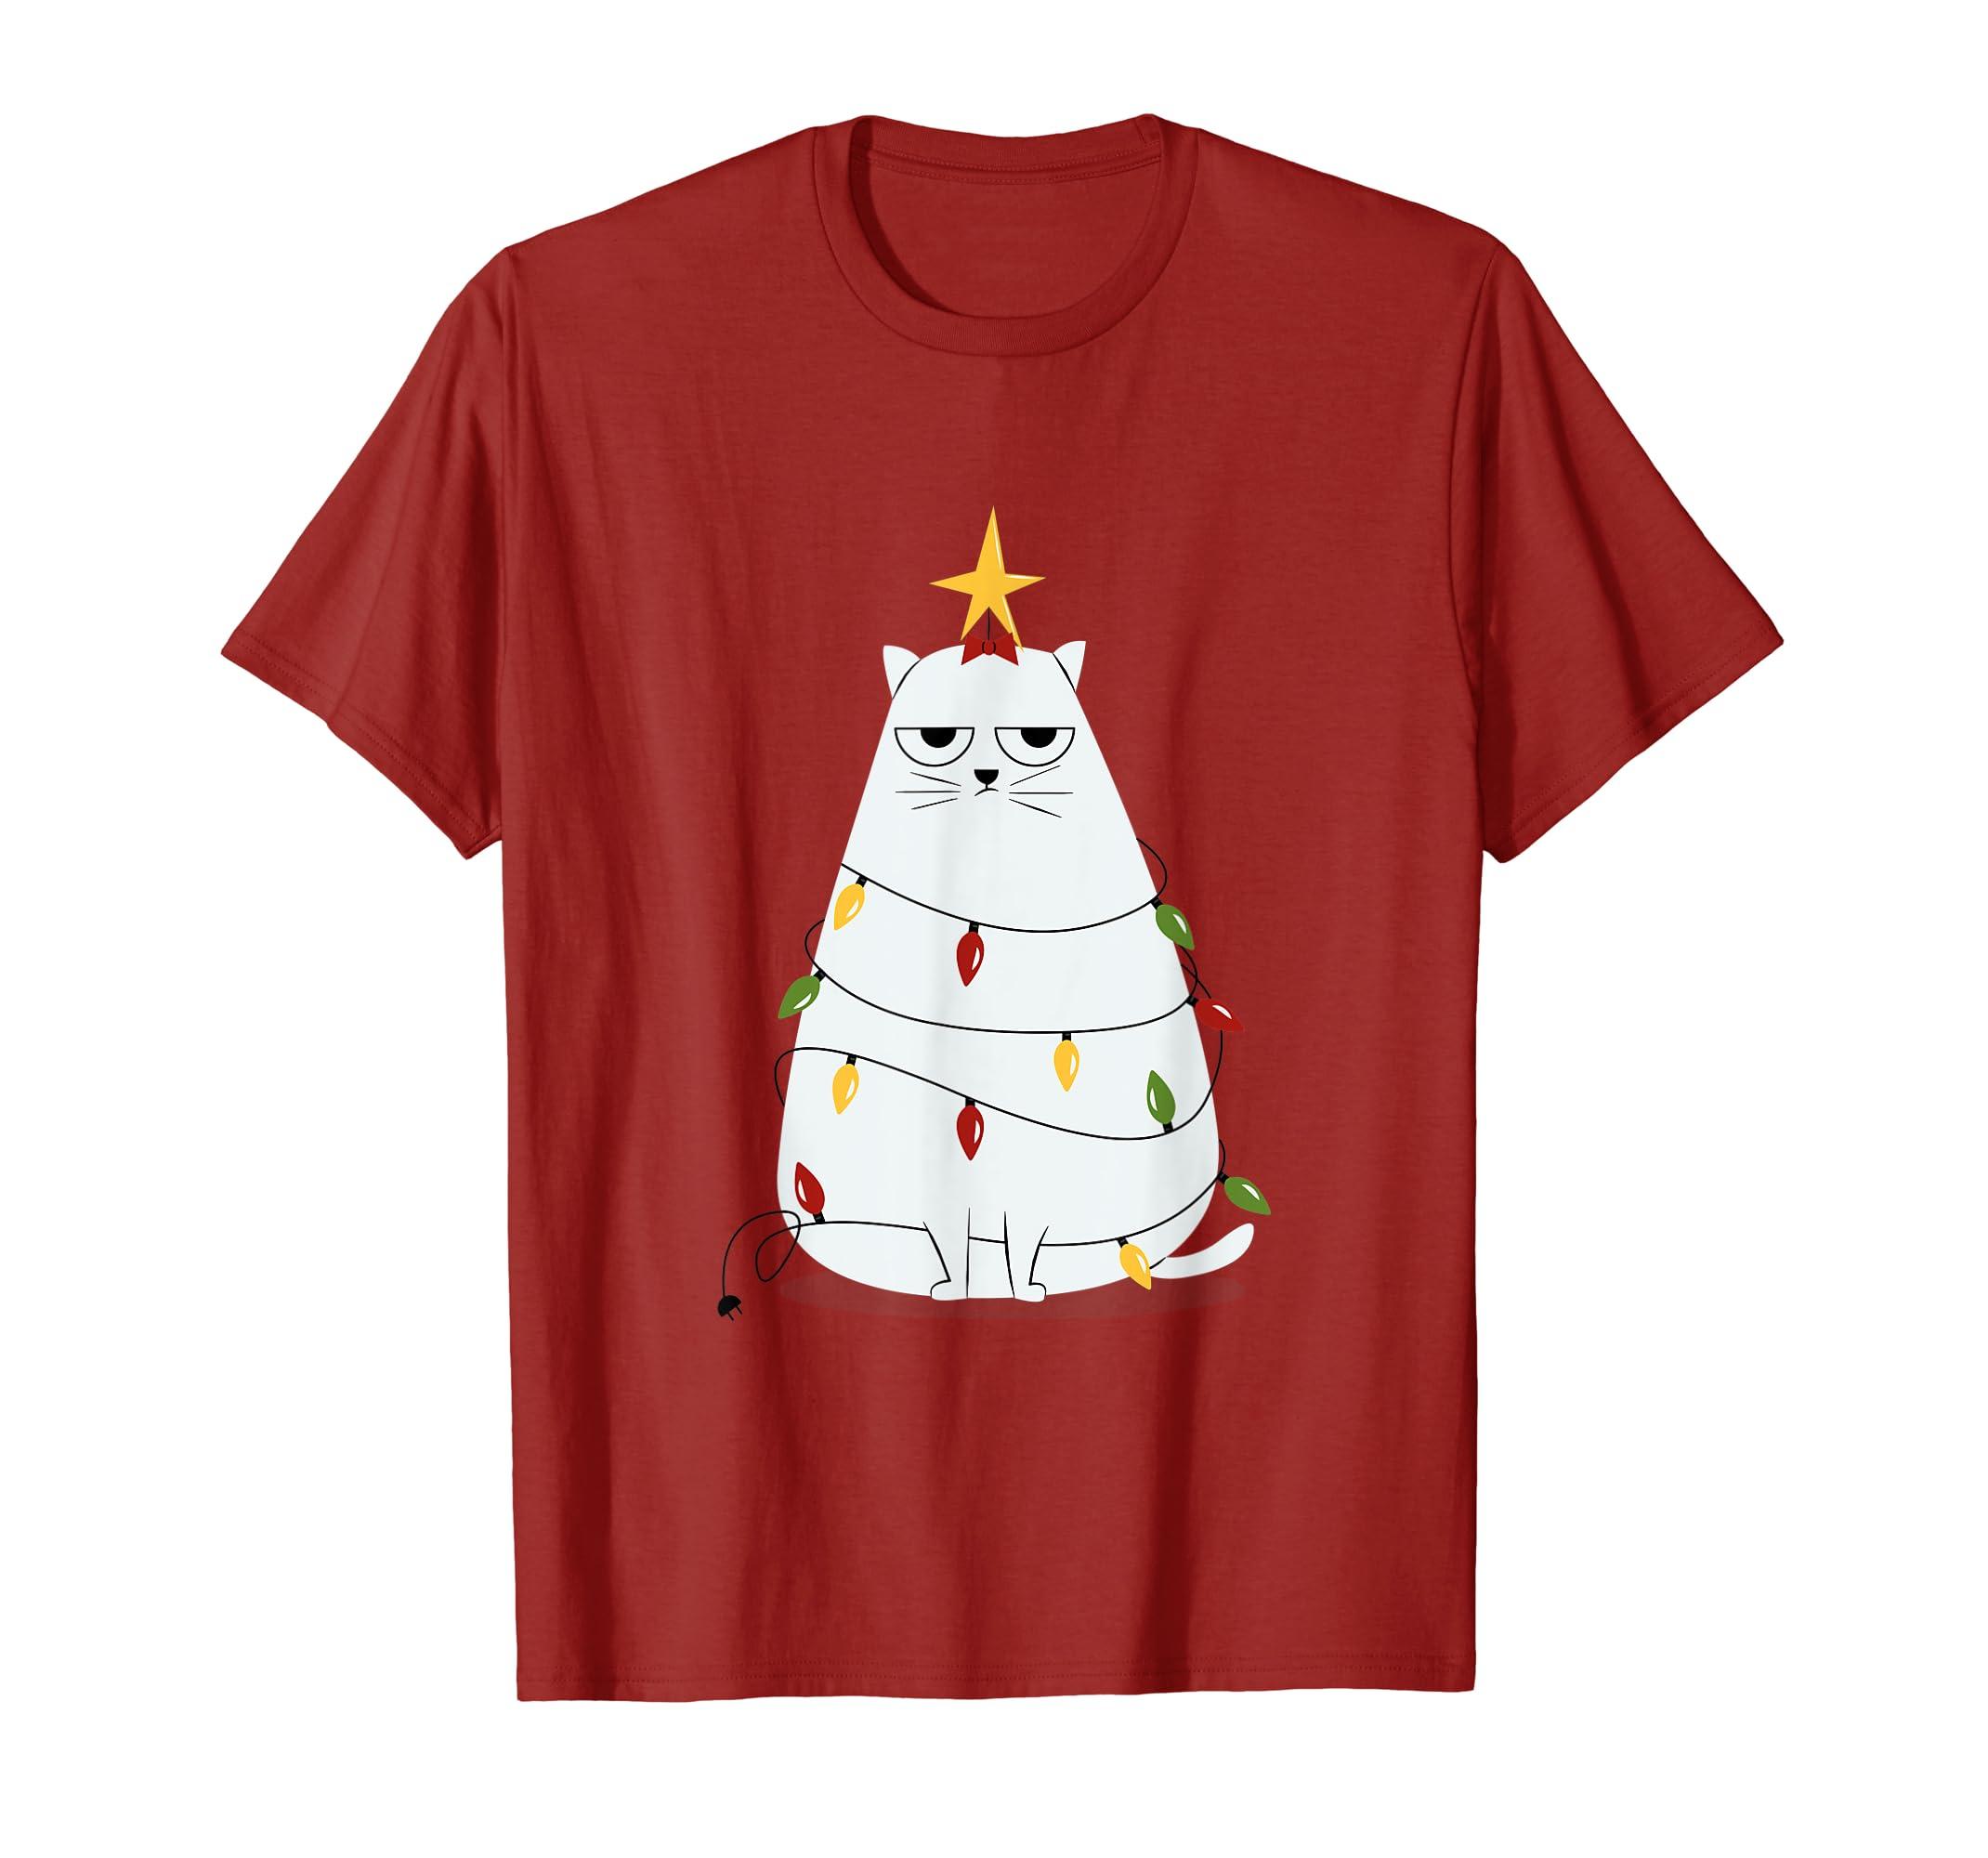 9acff7d4 Amazon.com: Annoyed Funny Christmas Cat Shirt for Xmas Day: Clothing